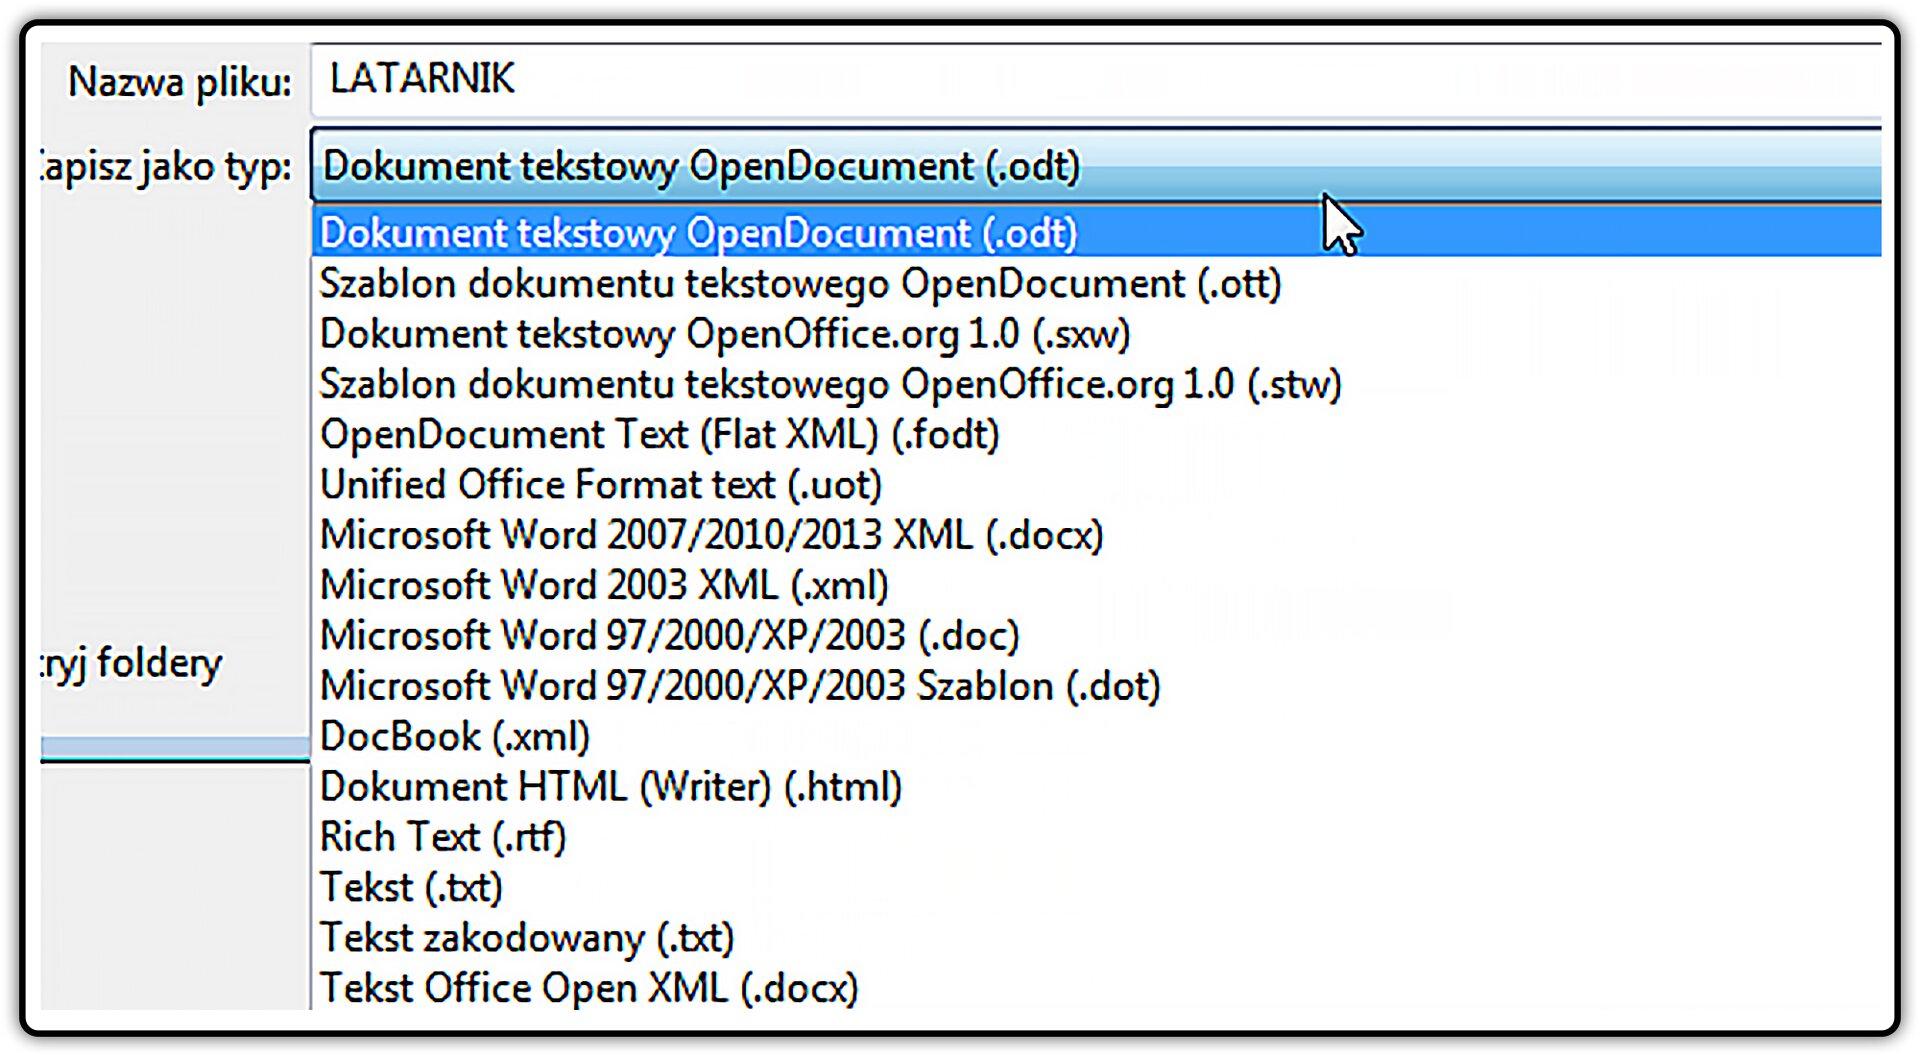 Zrzut okna zformatami zapisu dokumentu tekstowego wprogramie LibreOffice Writer